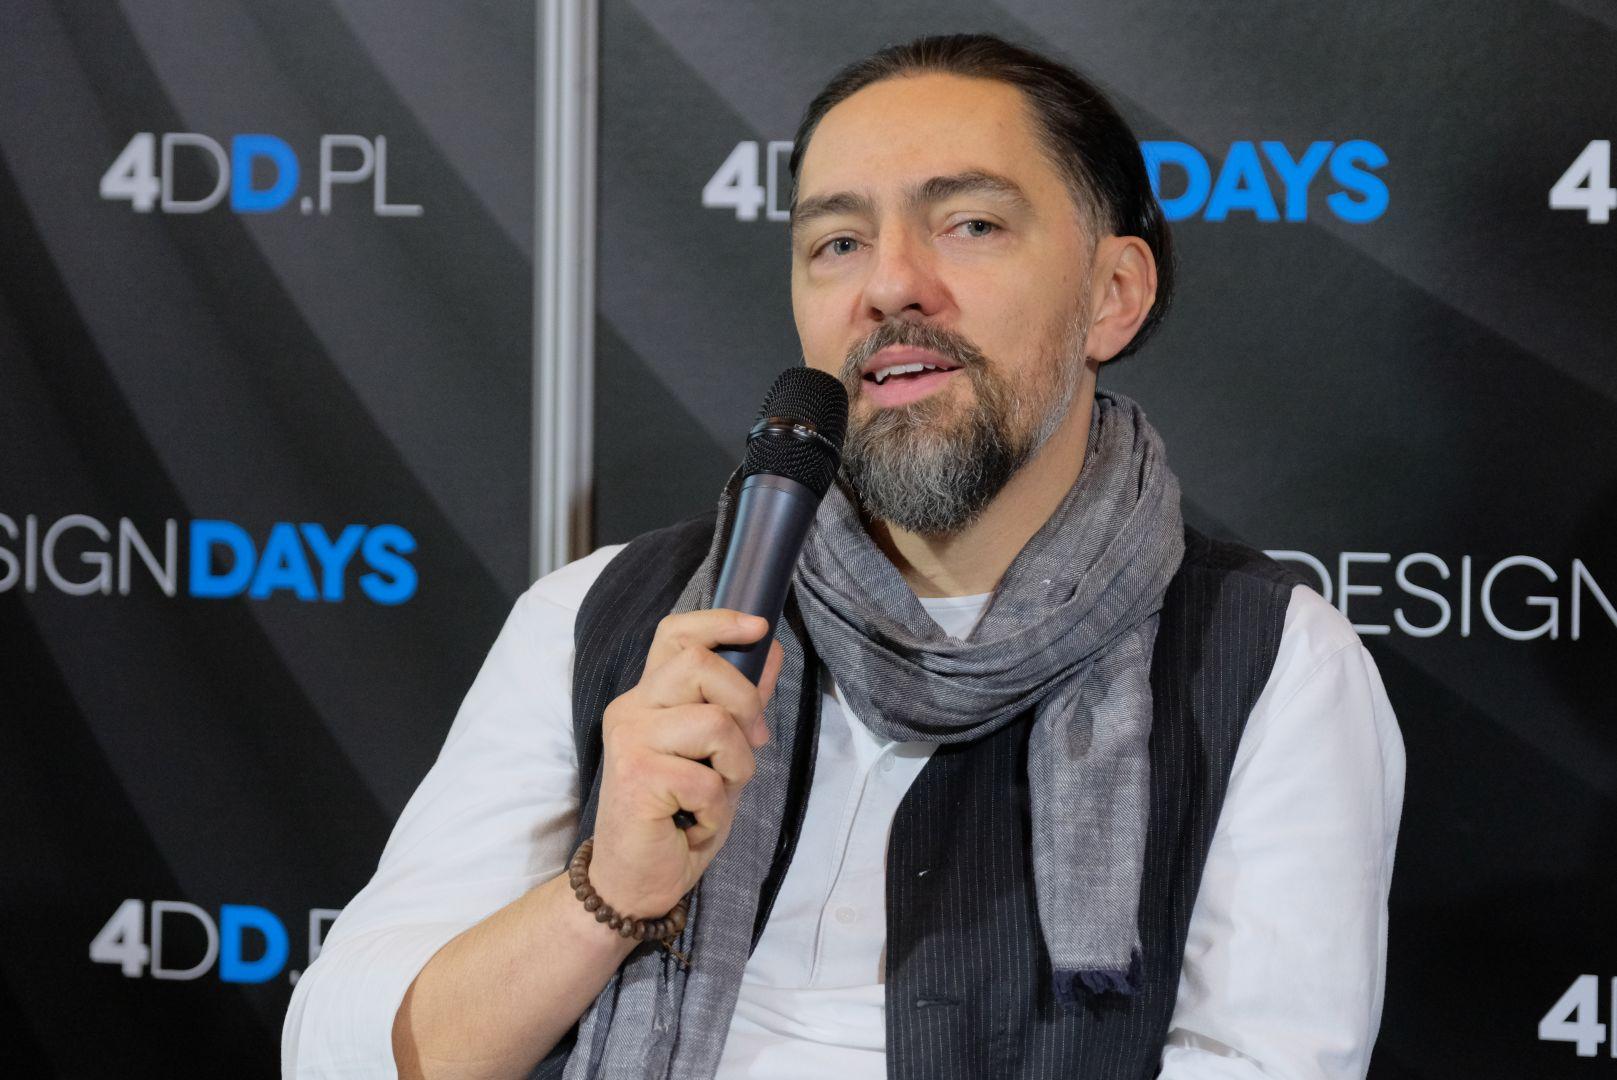 Grzegorz Goworek